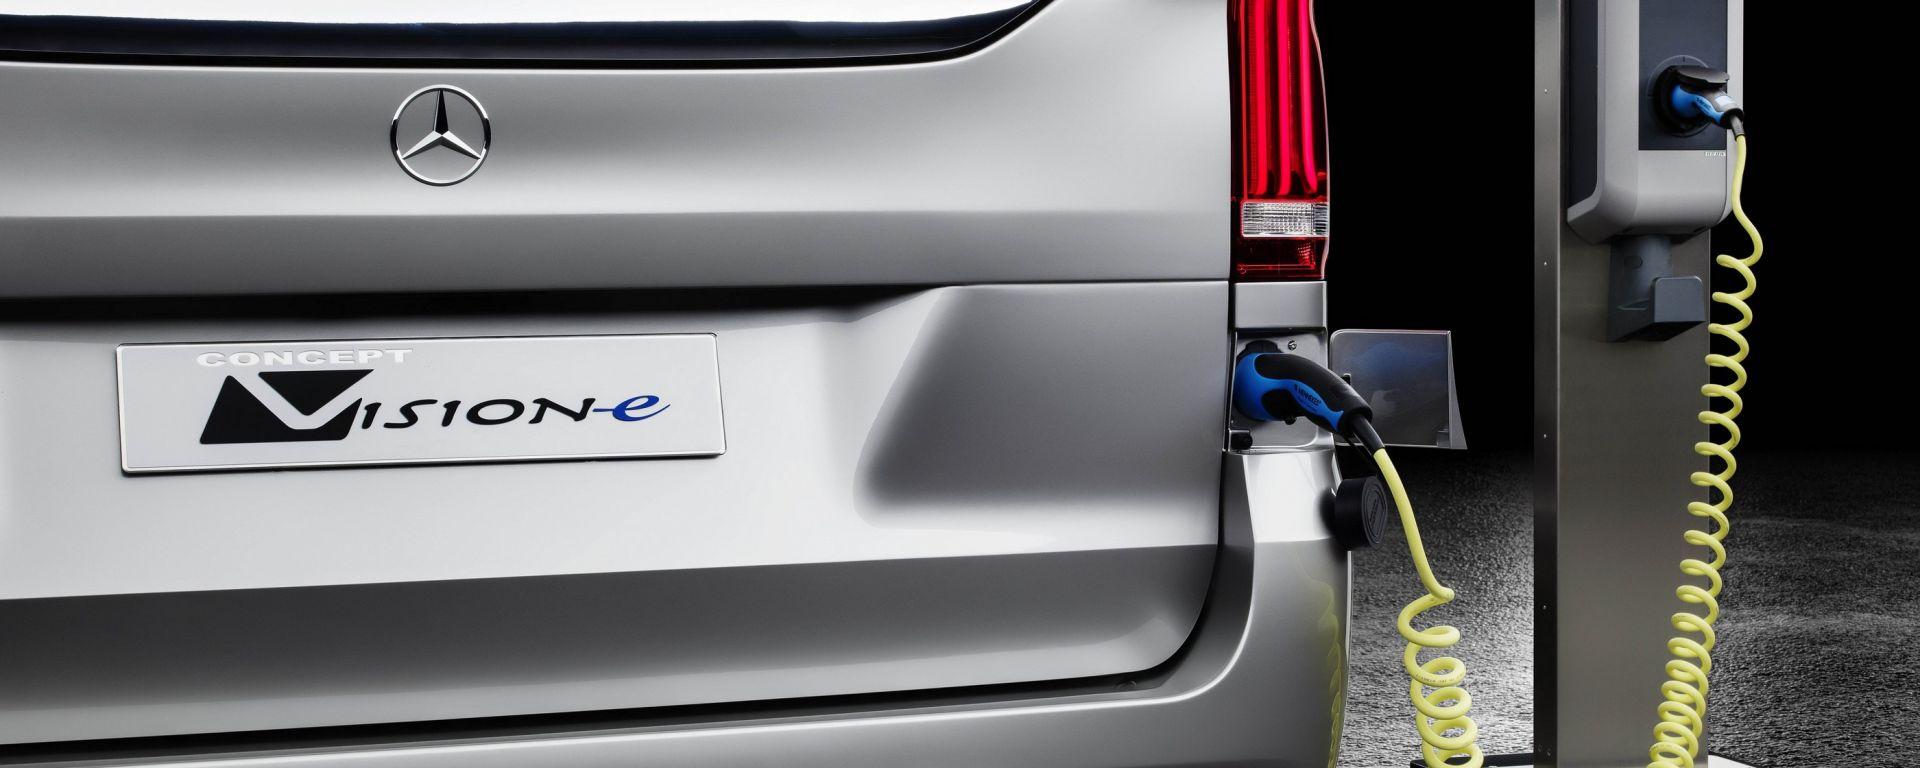 Mercedes Concept V-sion e